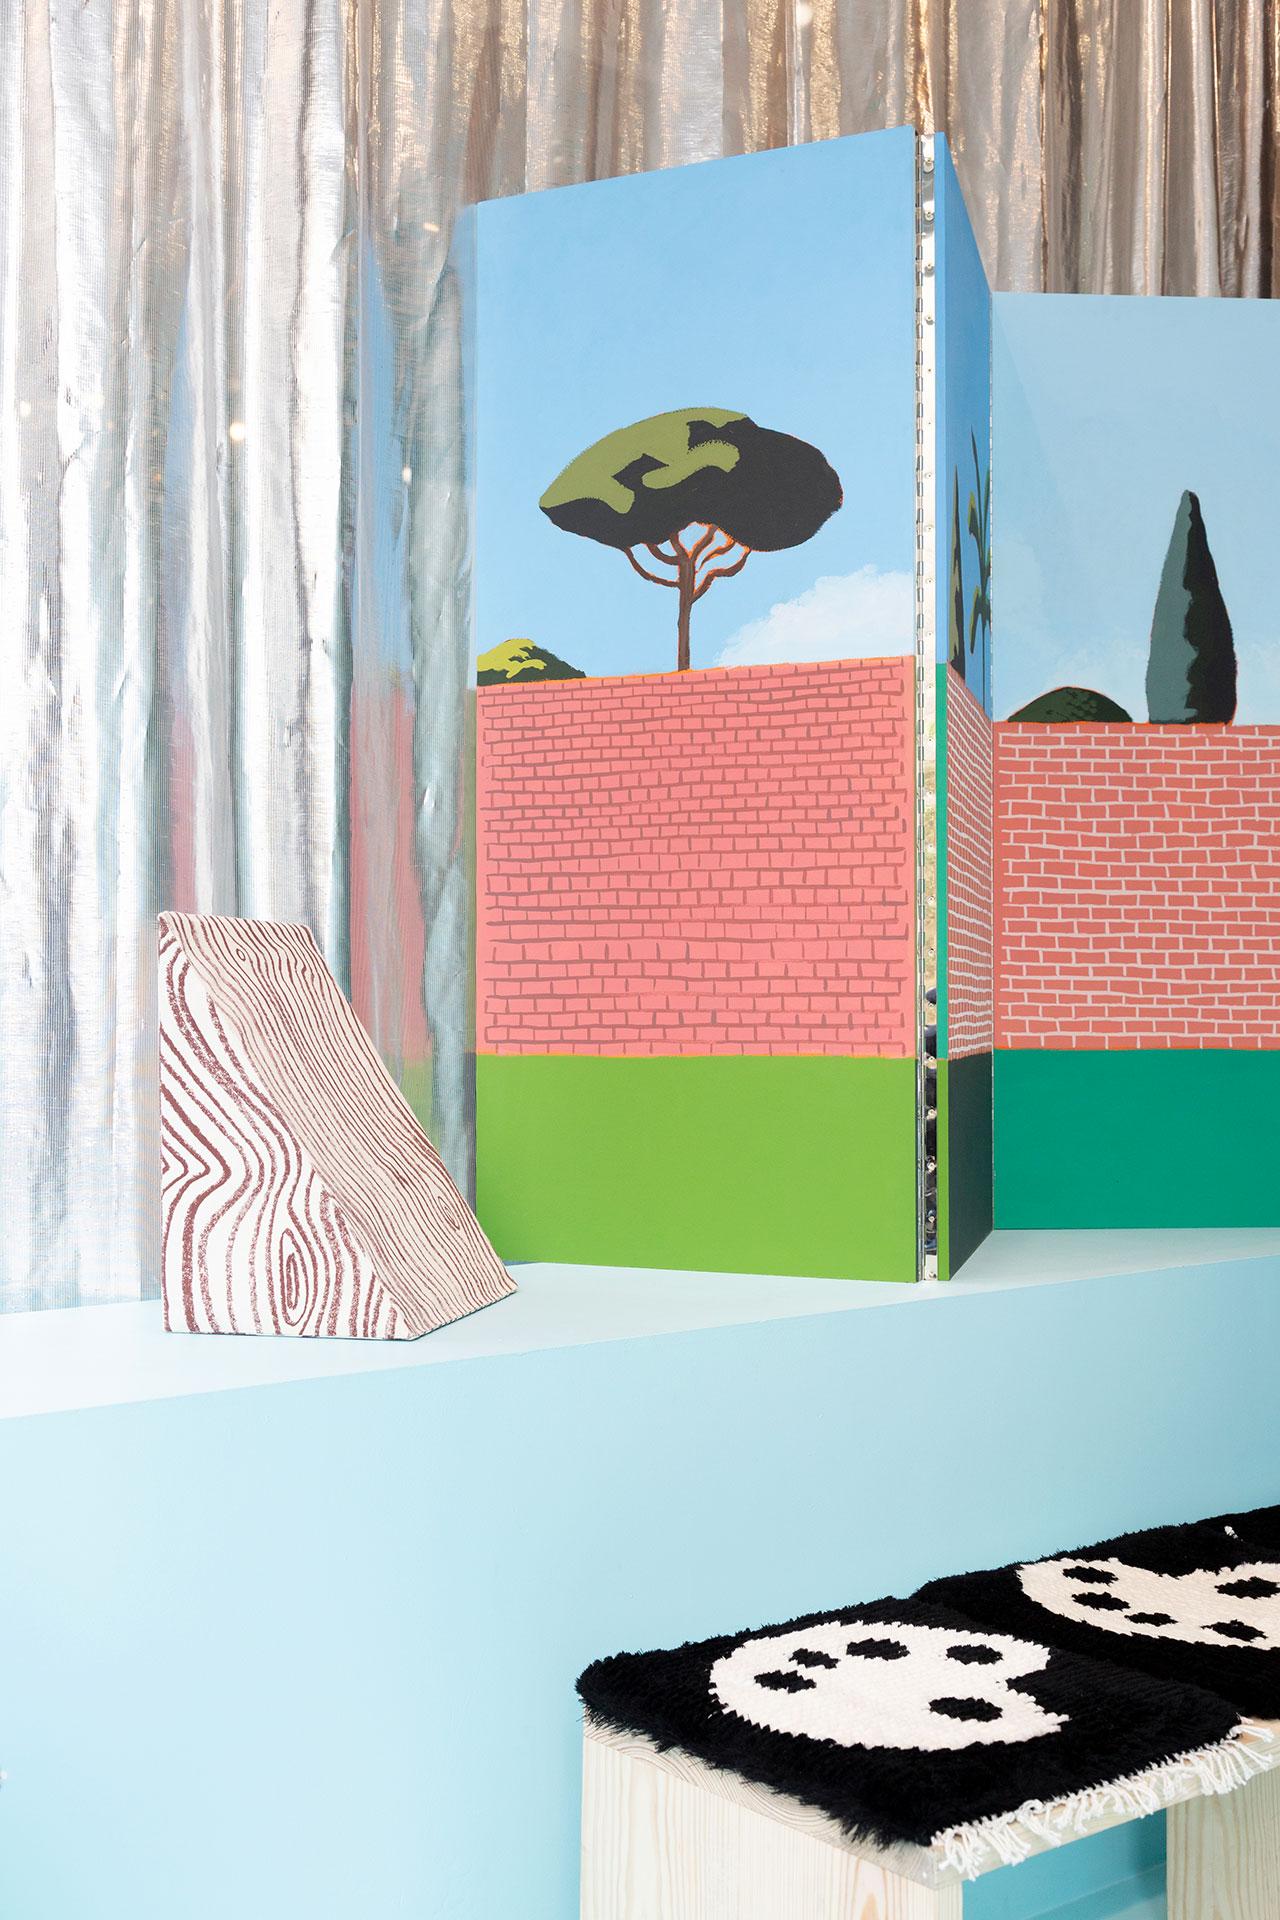 """Cales"" cushion by Elvire Bonduelle, ""Paravent Ostia"" screen by Matthieu Cossé and ""White Paw"" chair mat by Camila Oliveira Fairclough. Photography © Émile Kirsch."